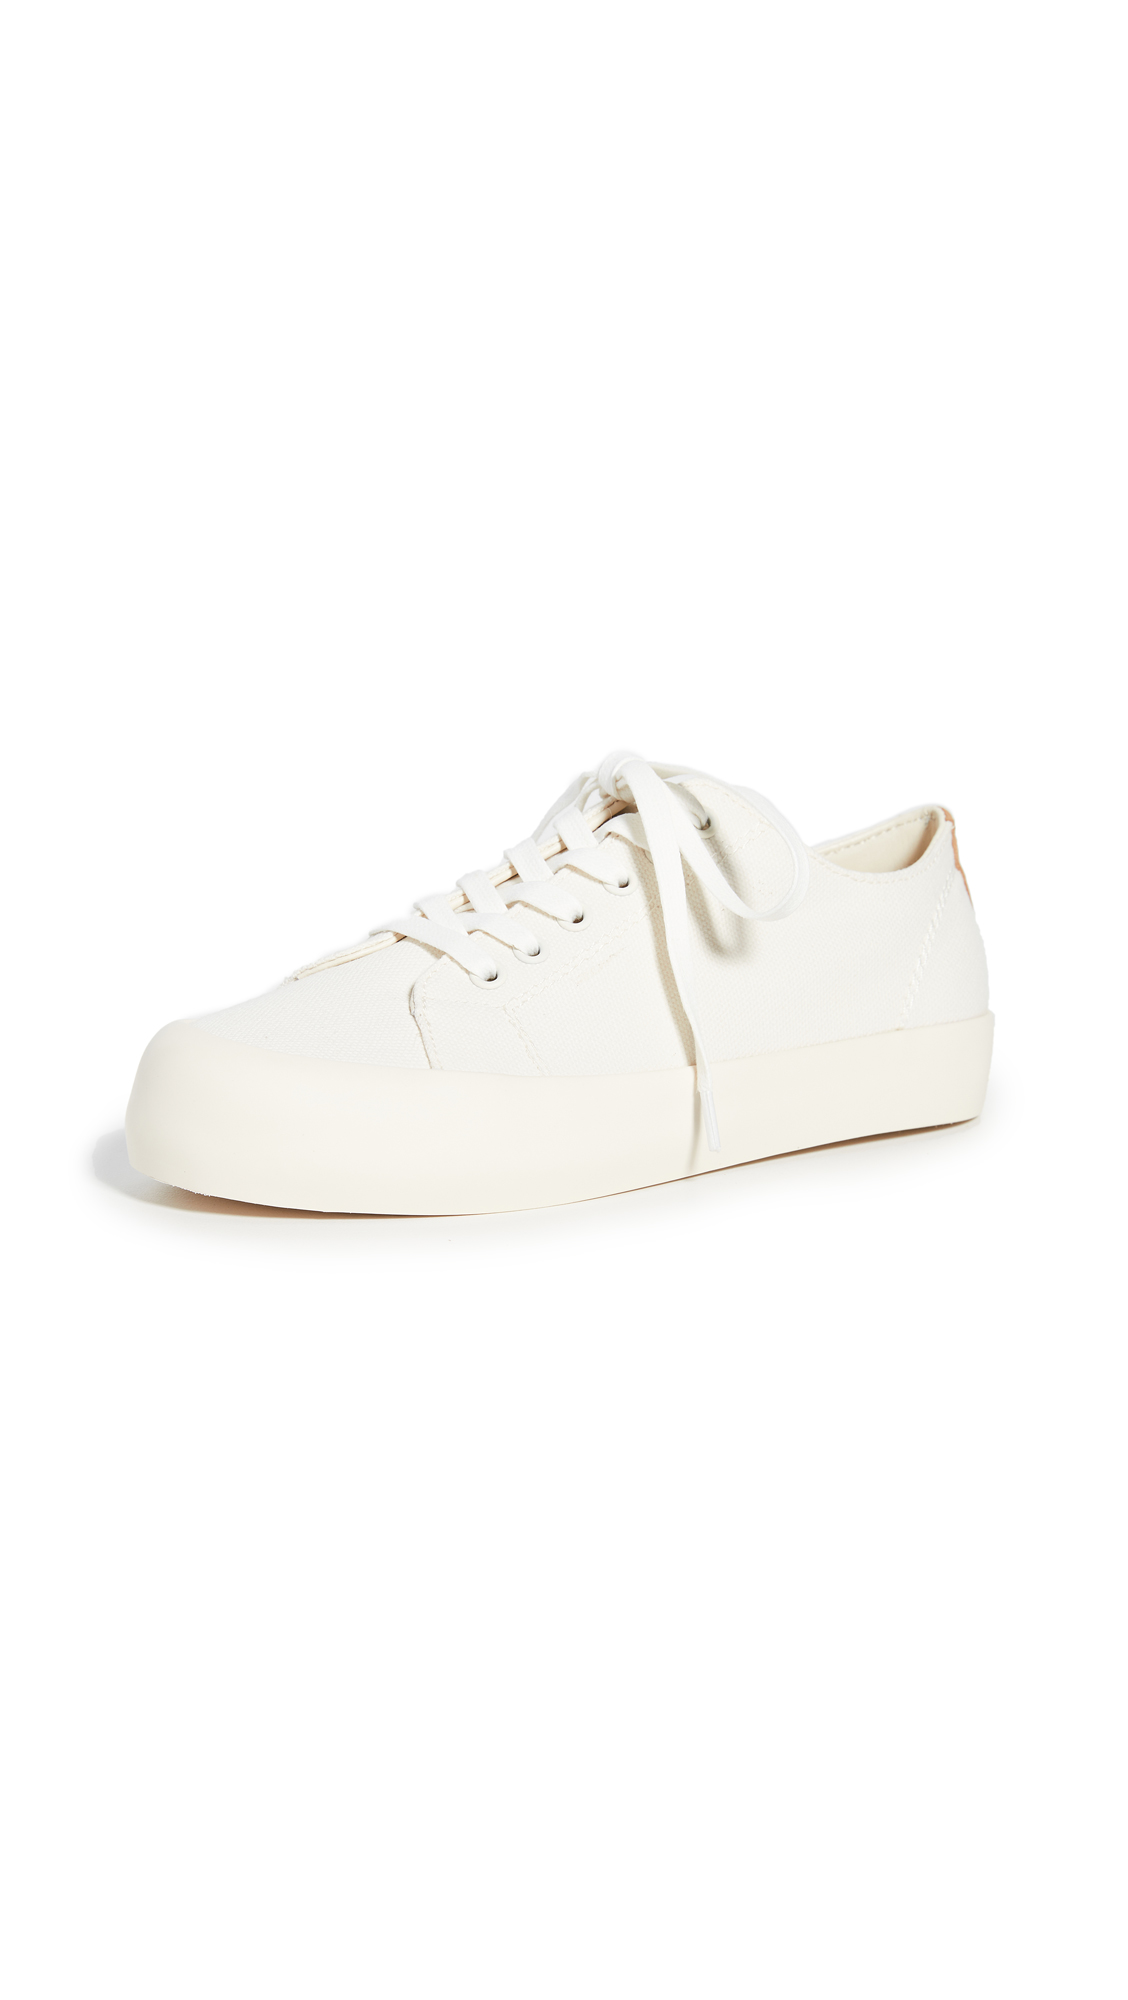 Buy Vince Norwell Sneakers online, shop Vince